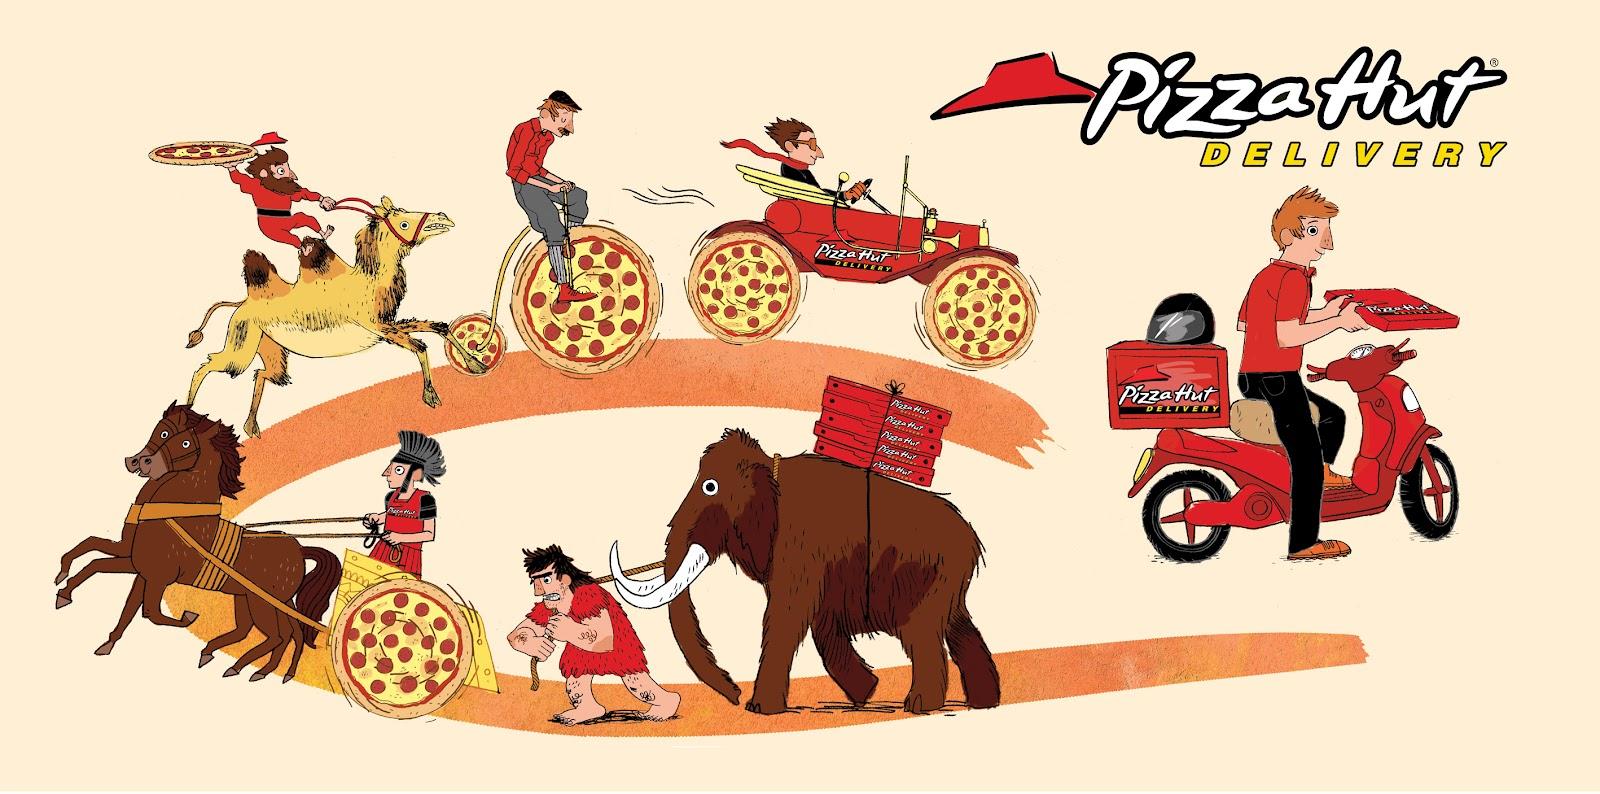 mr steve mccarthys illustration blog: pizza hut menu